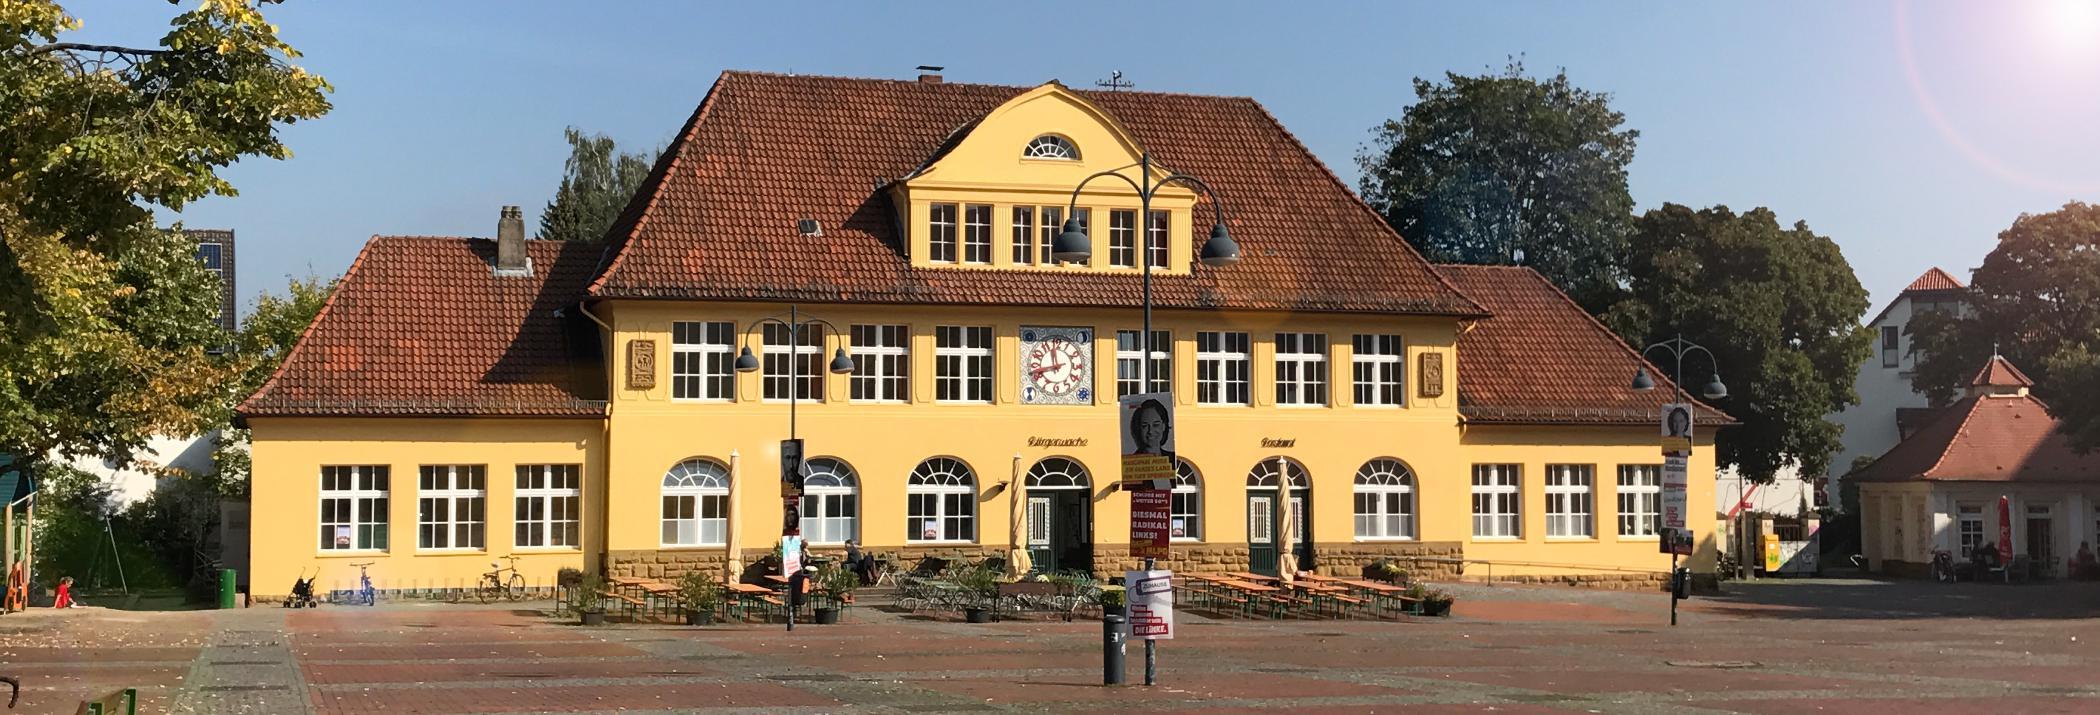 Bürgerwache Siegfriedplatz . Bielefeld